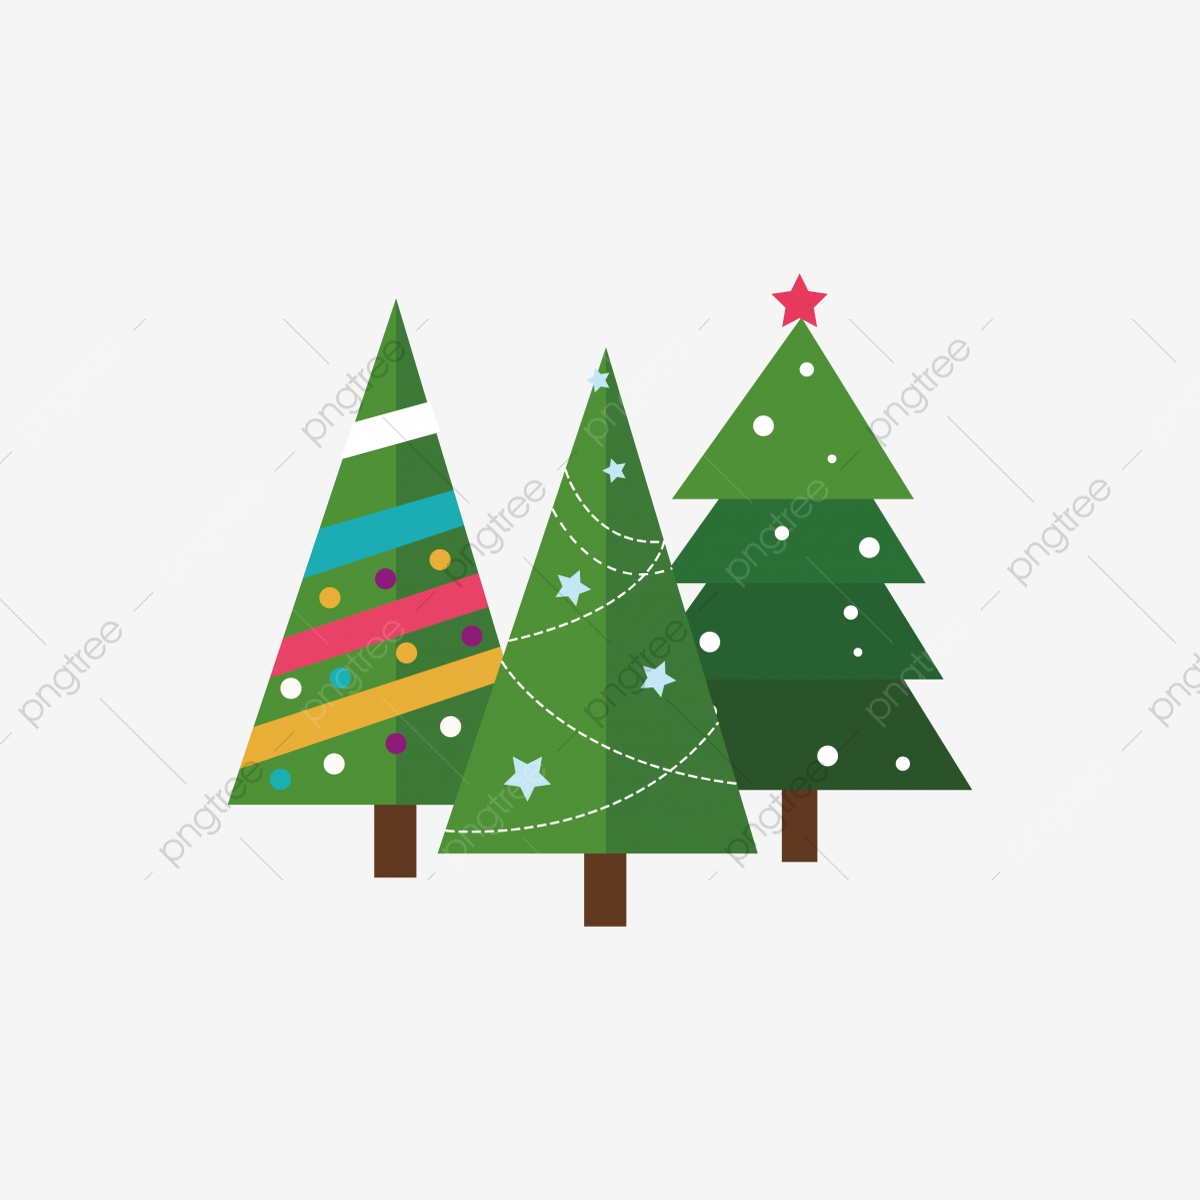 Stella Di Natale A 5 Punte.Verde Natale Albero Di Pino Stella A Cinque Punte Natale Stella A